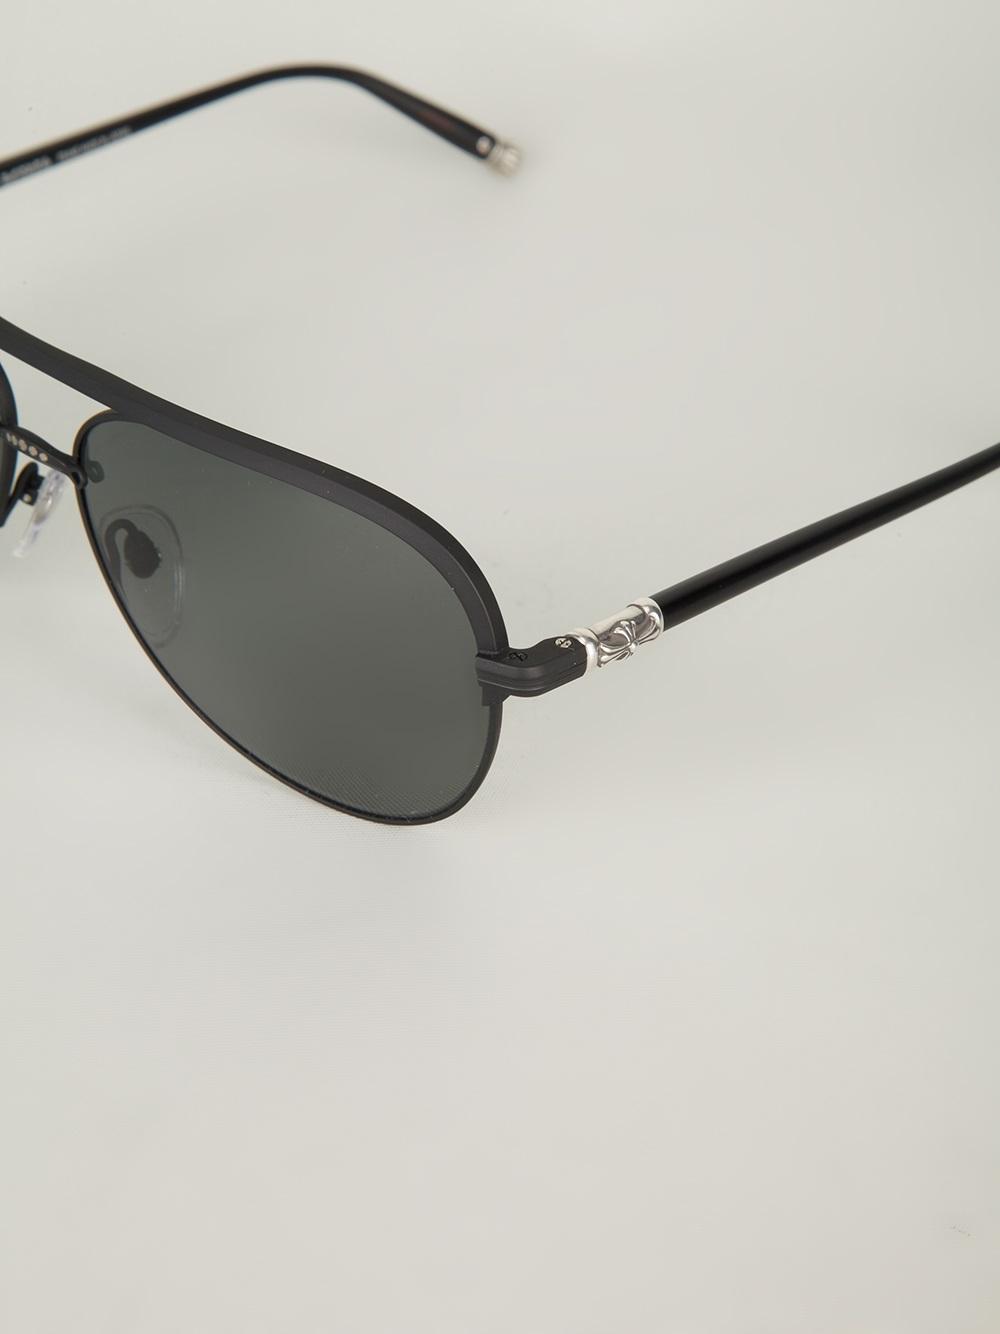 Chrome Hearts Probasshole Sunglasses In Black For Men Lyst